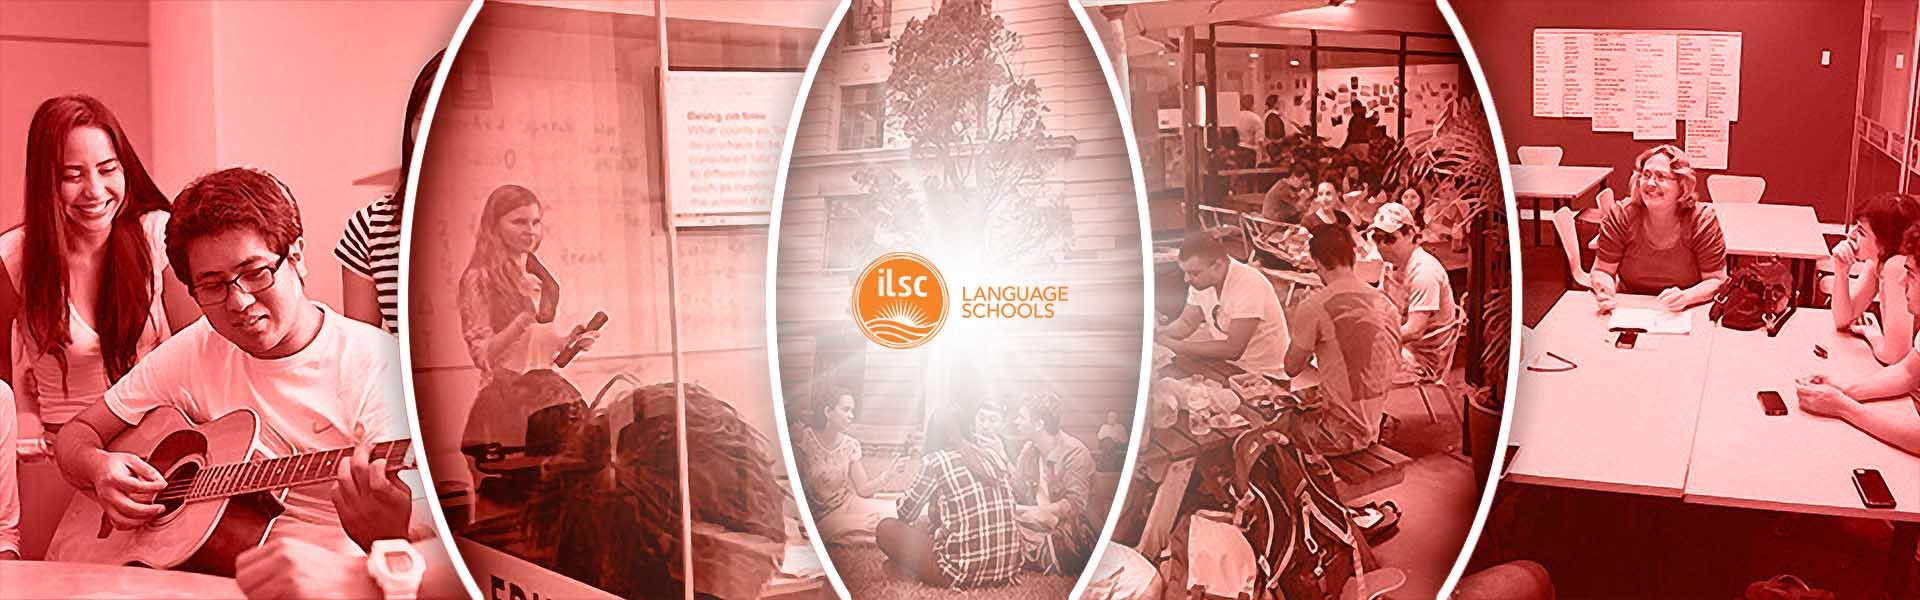 ILSC Brisbane Dil Okulu